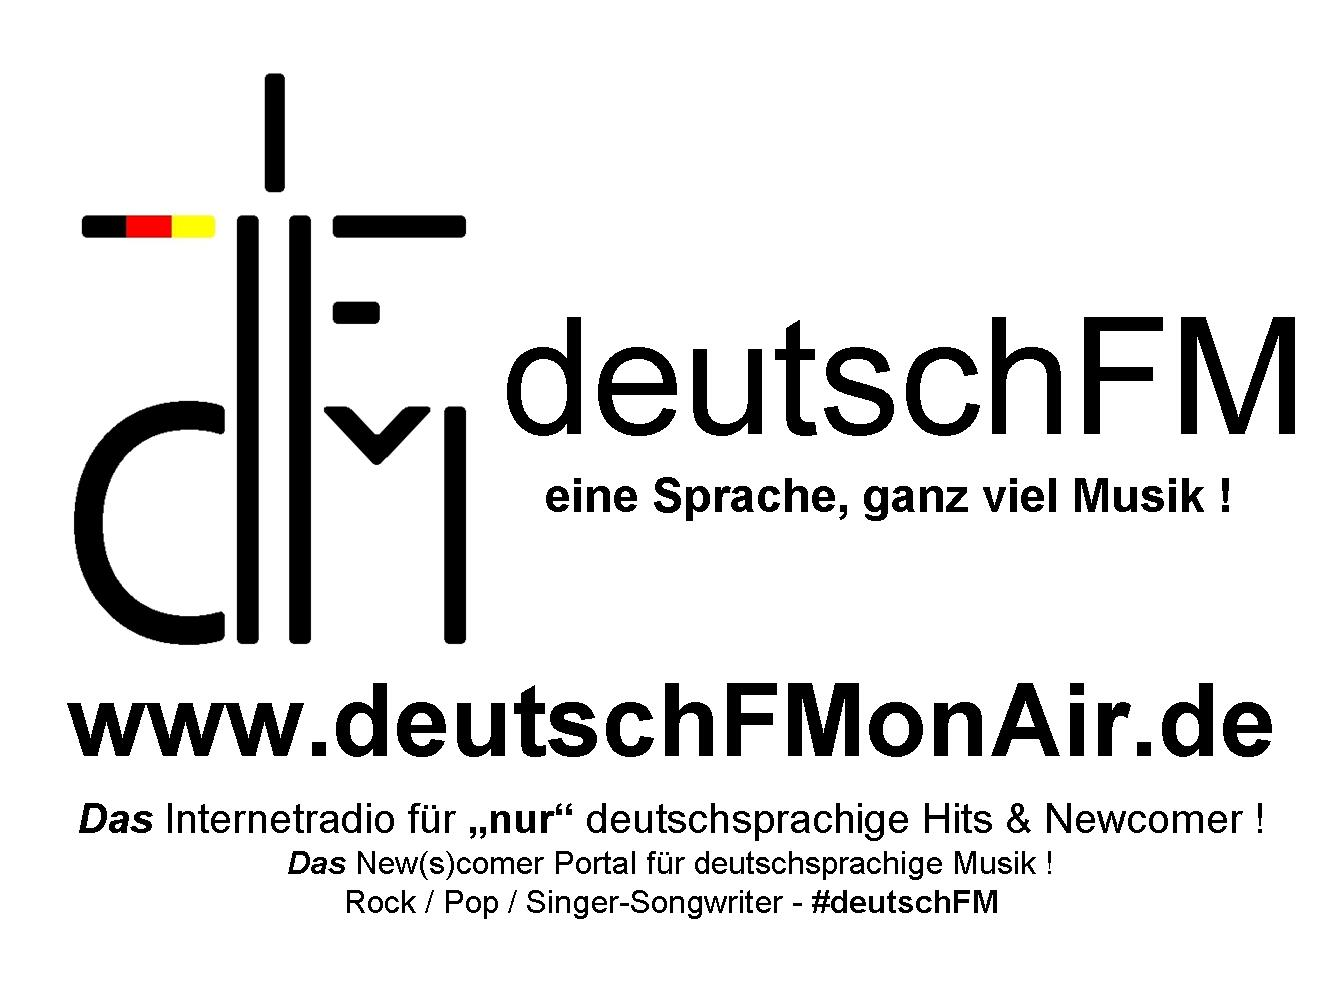 deutschFMonAir.de